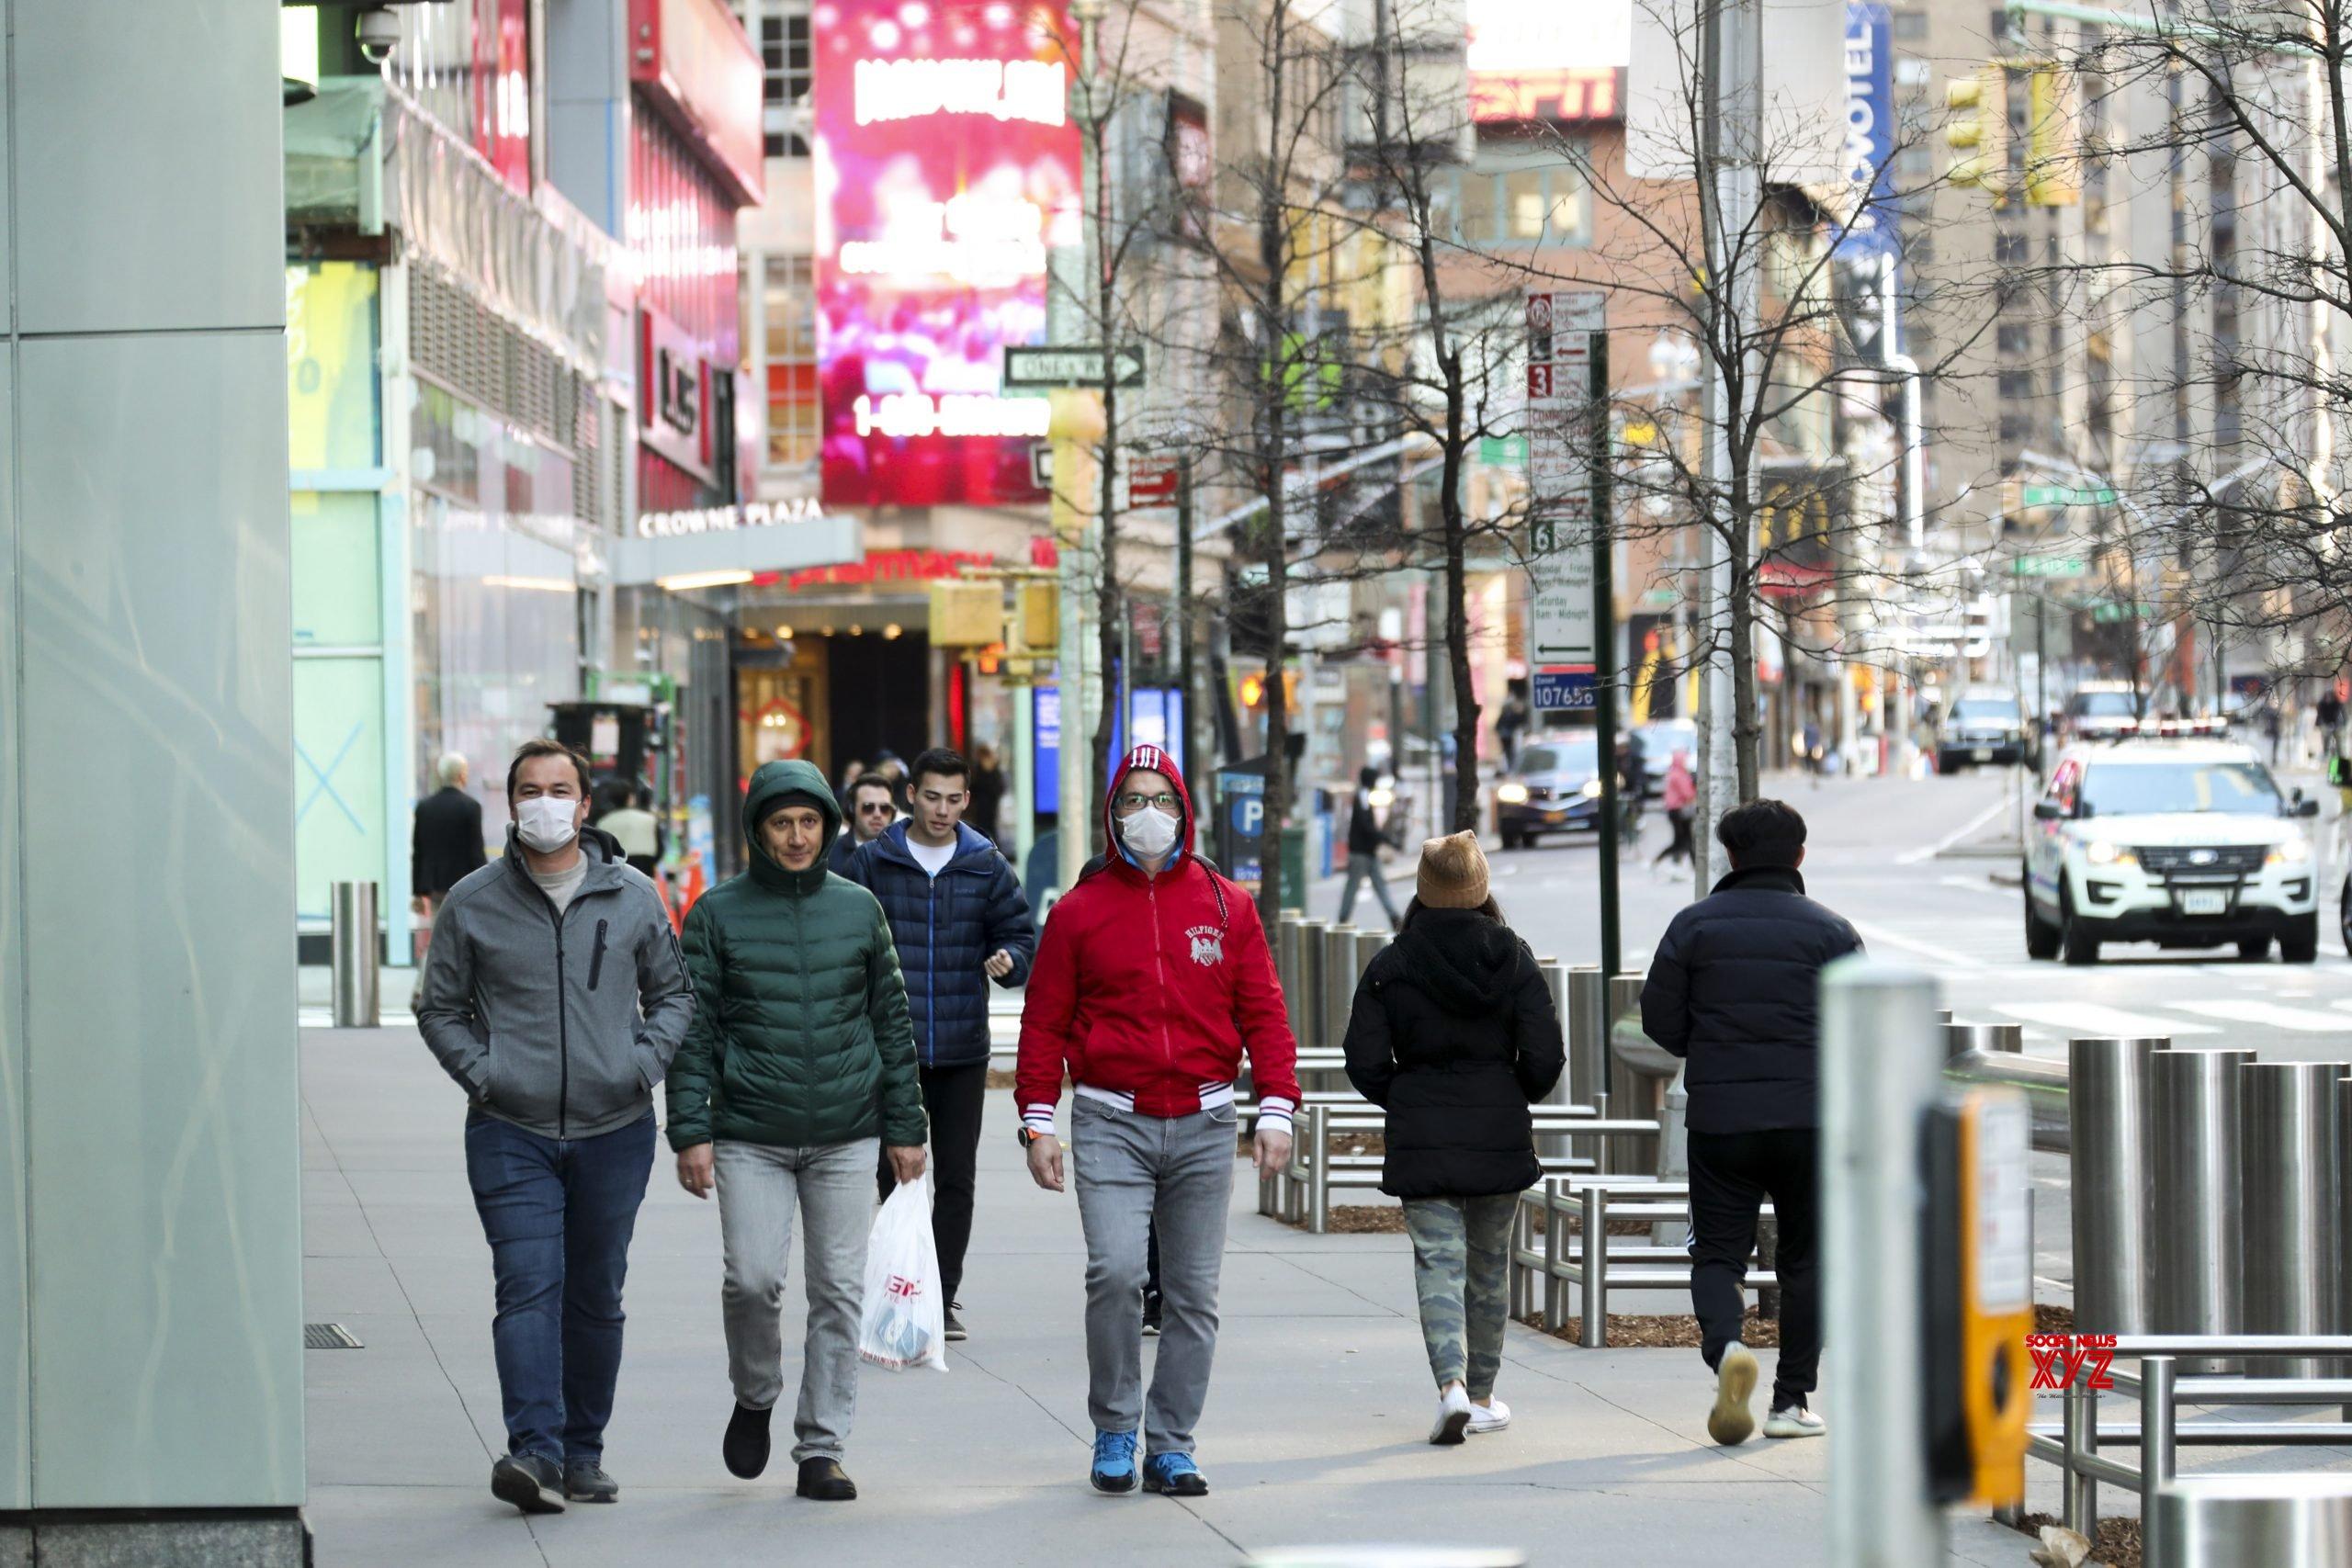 New York Governor Says Social Distancing Slowing Coronavirus